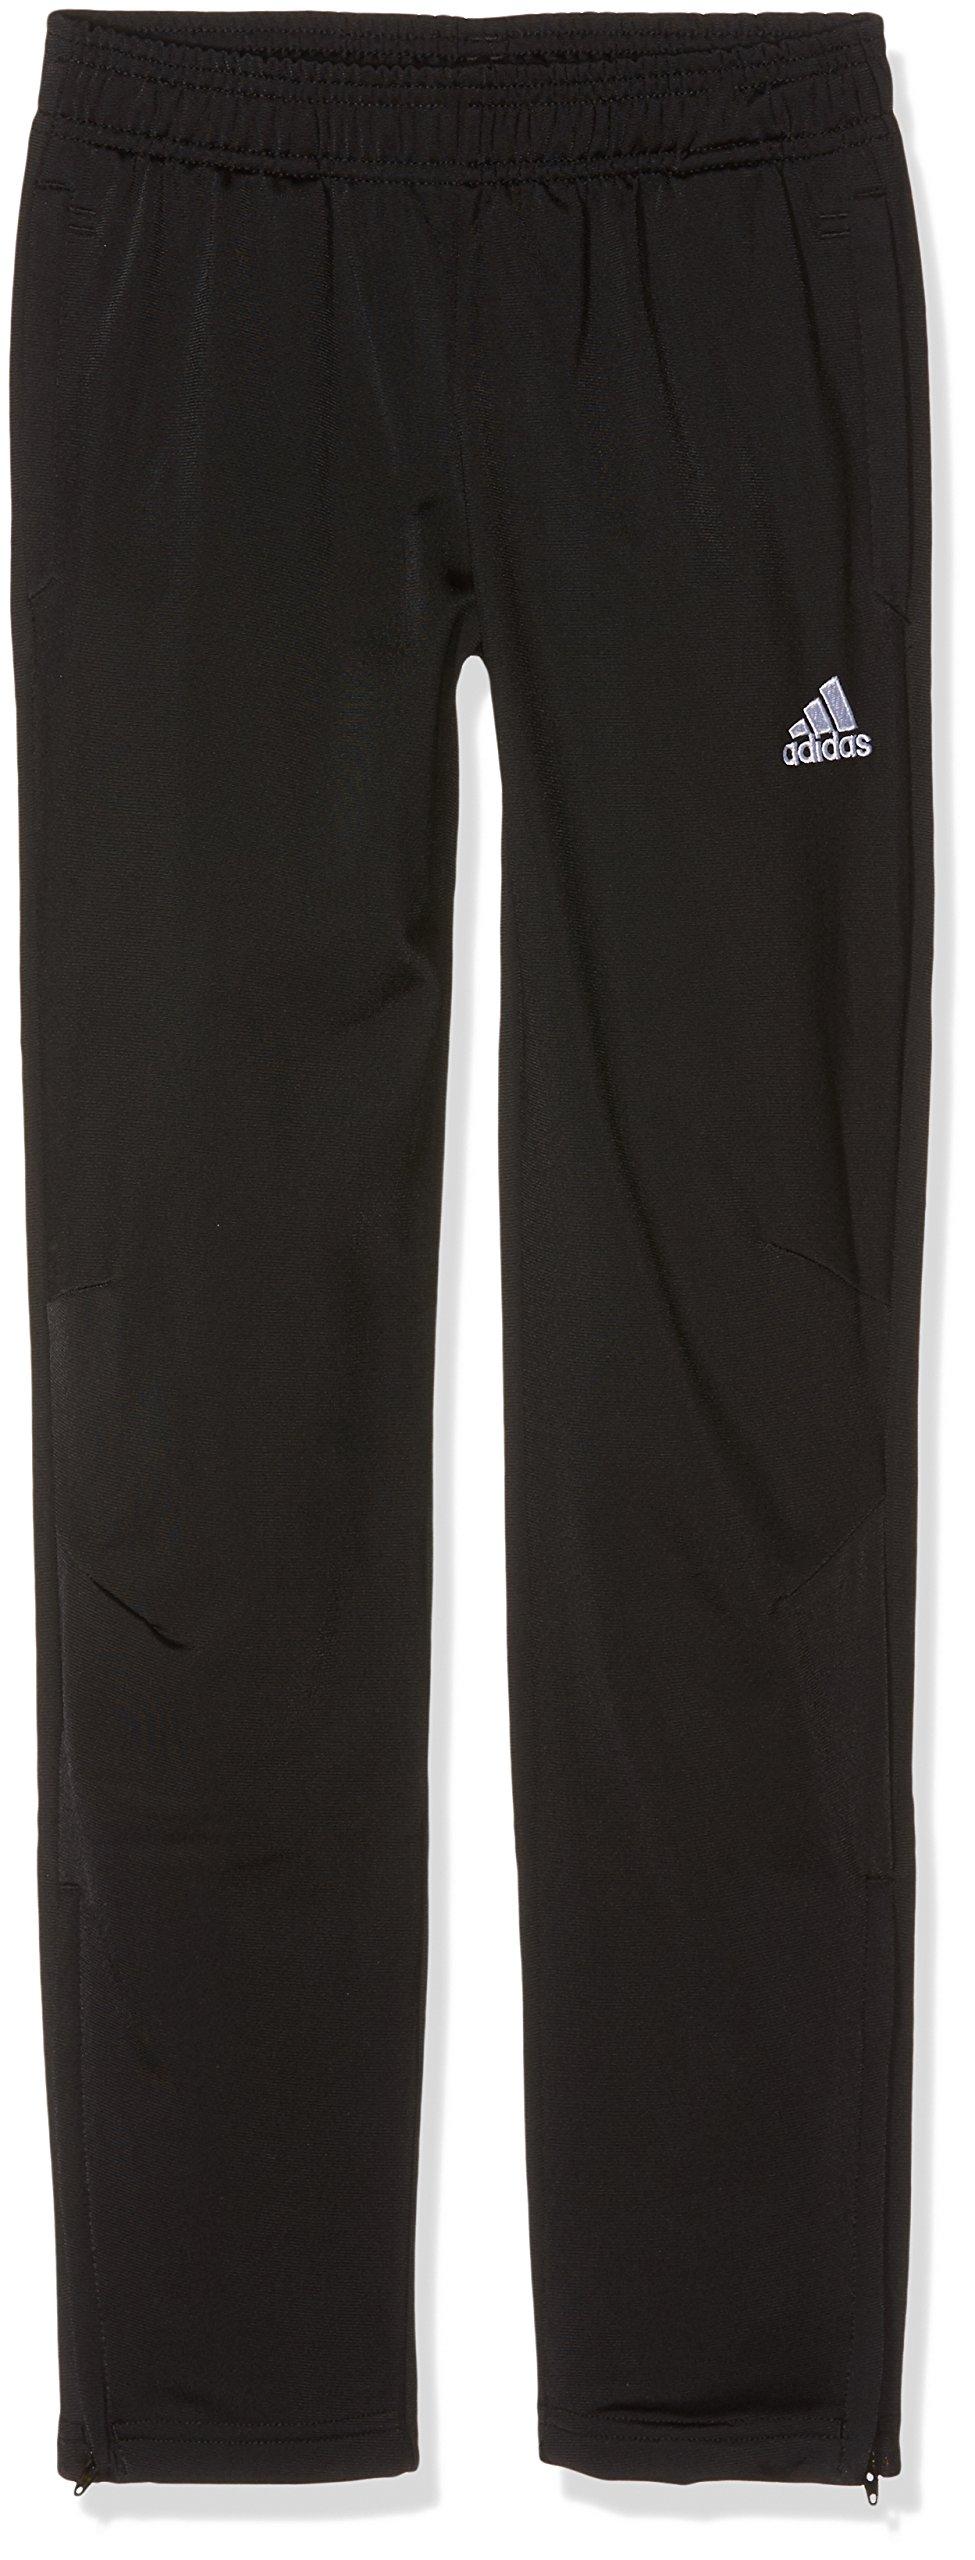 d51f917a3fb8d9 adidas Tiro17 PES PNTY, Pantaloni Bambino, (Nero/Bianco), 152 product